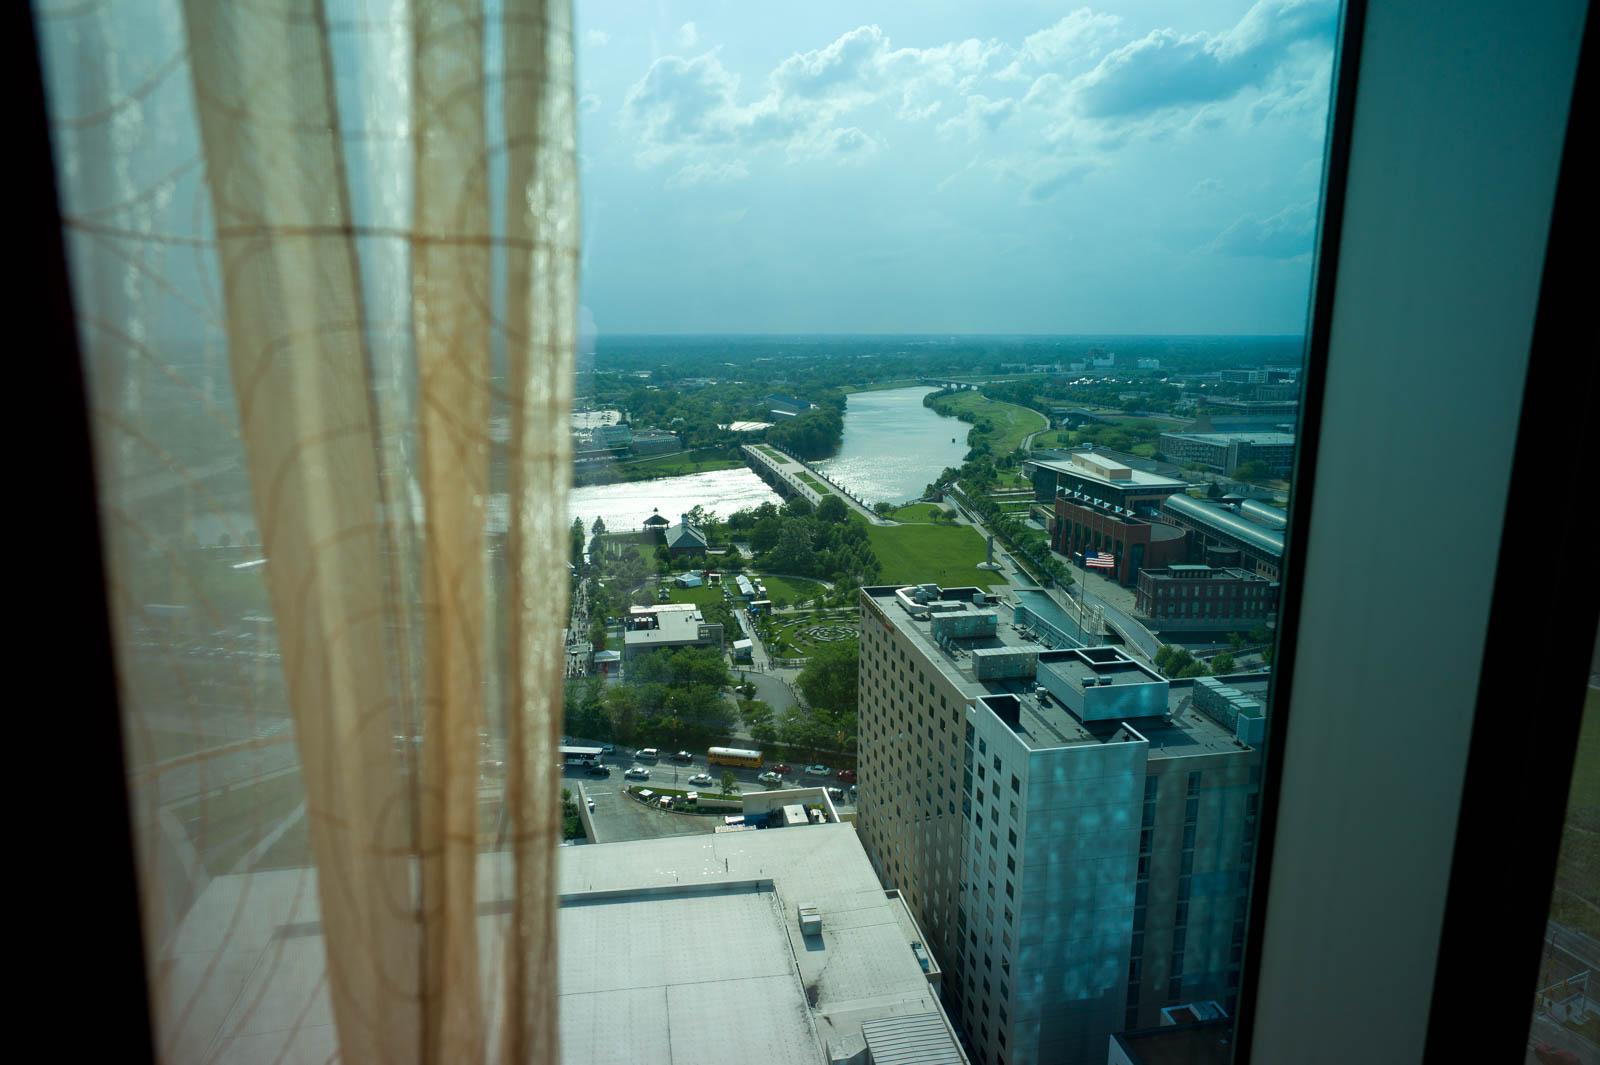 Room 2536, JW Marriott, Indianpolis